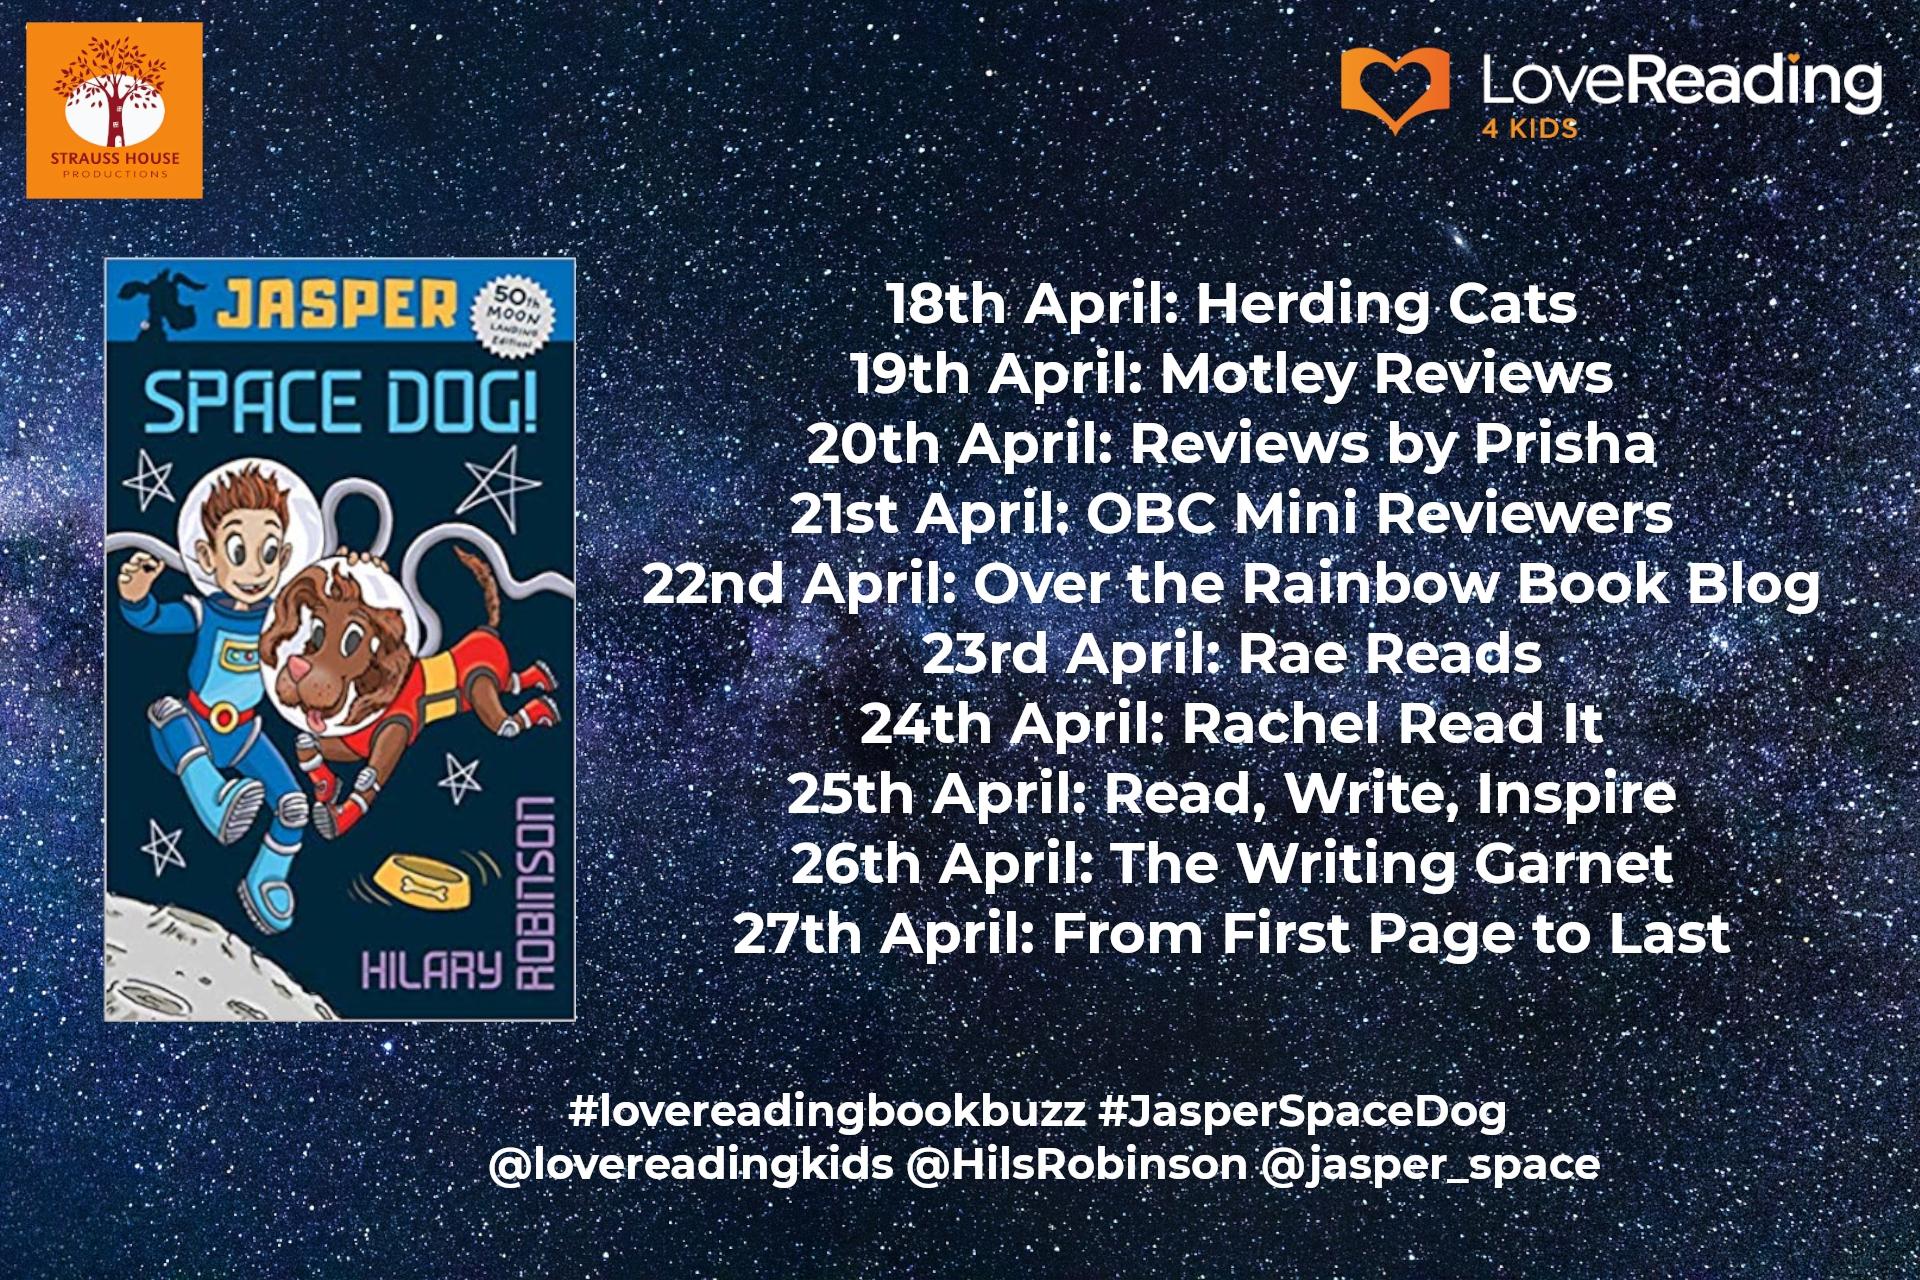 Ambassador Book Buzz: Jasper: Space Dog